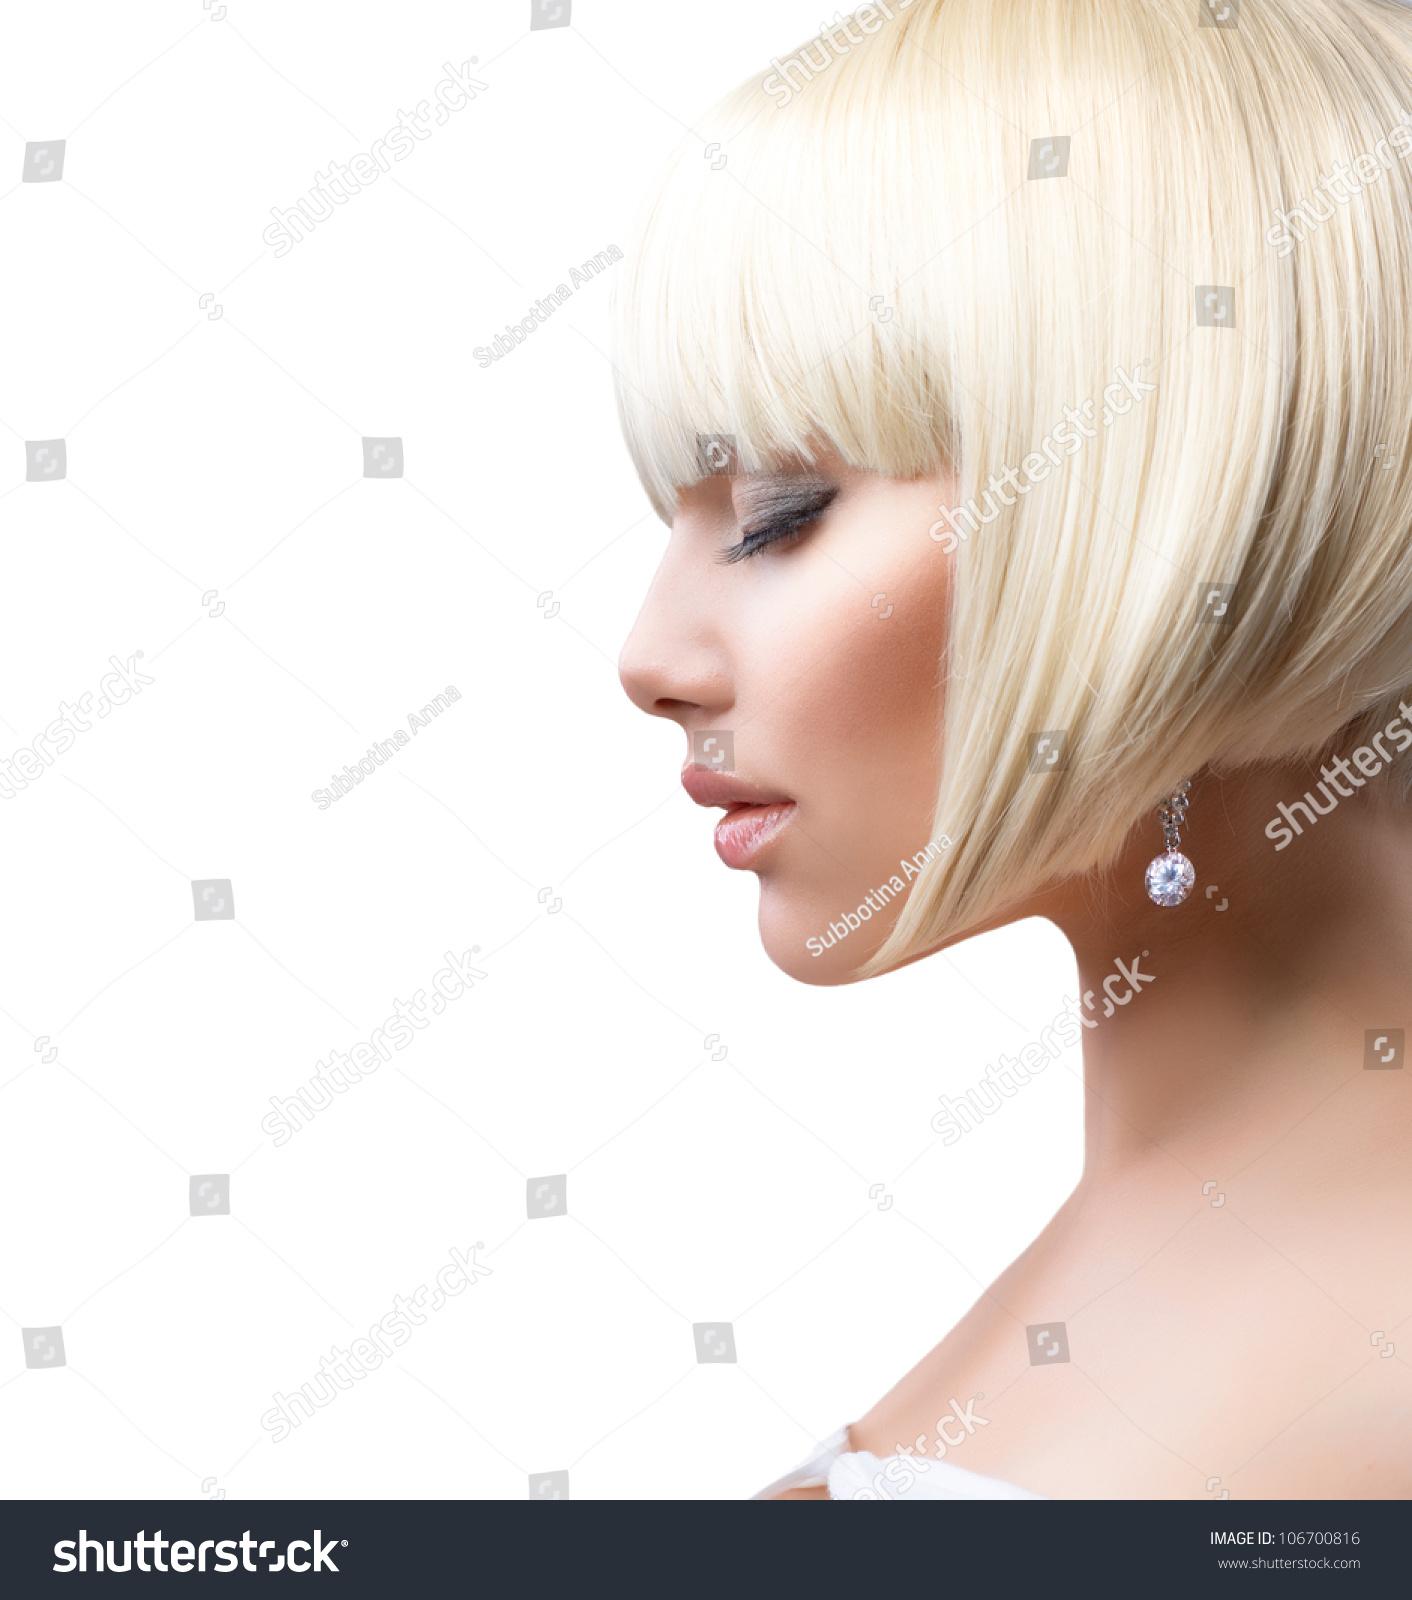 Blond Hair Haircut Beautiful Girl Healthy Short Stock Photo Edit